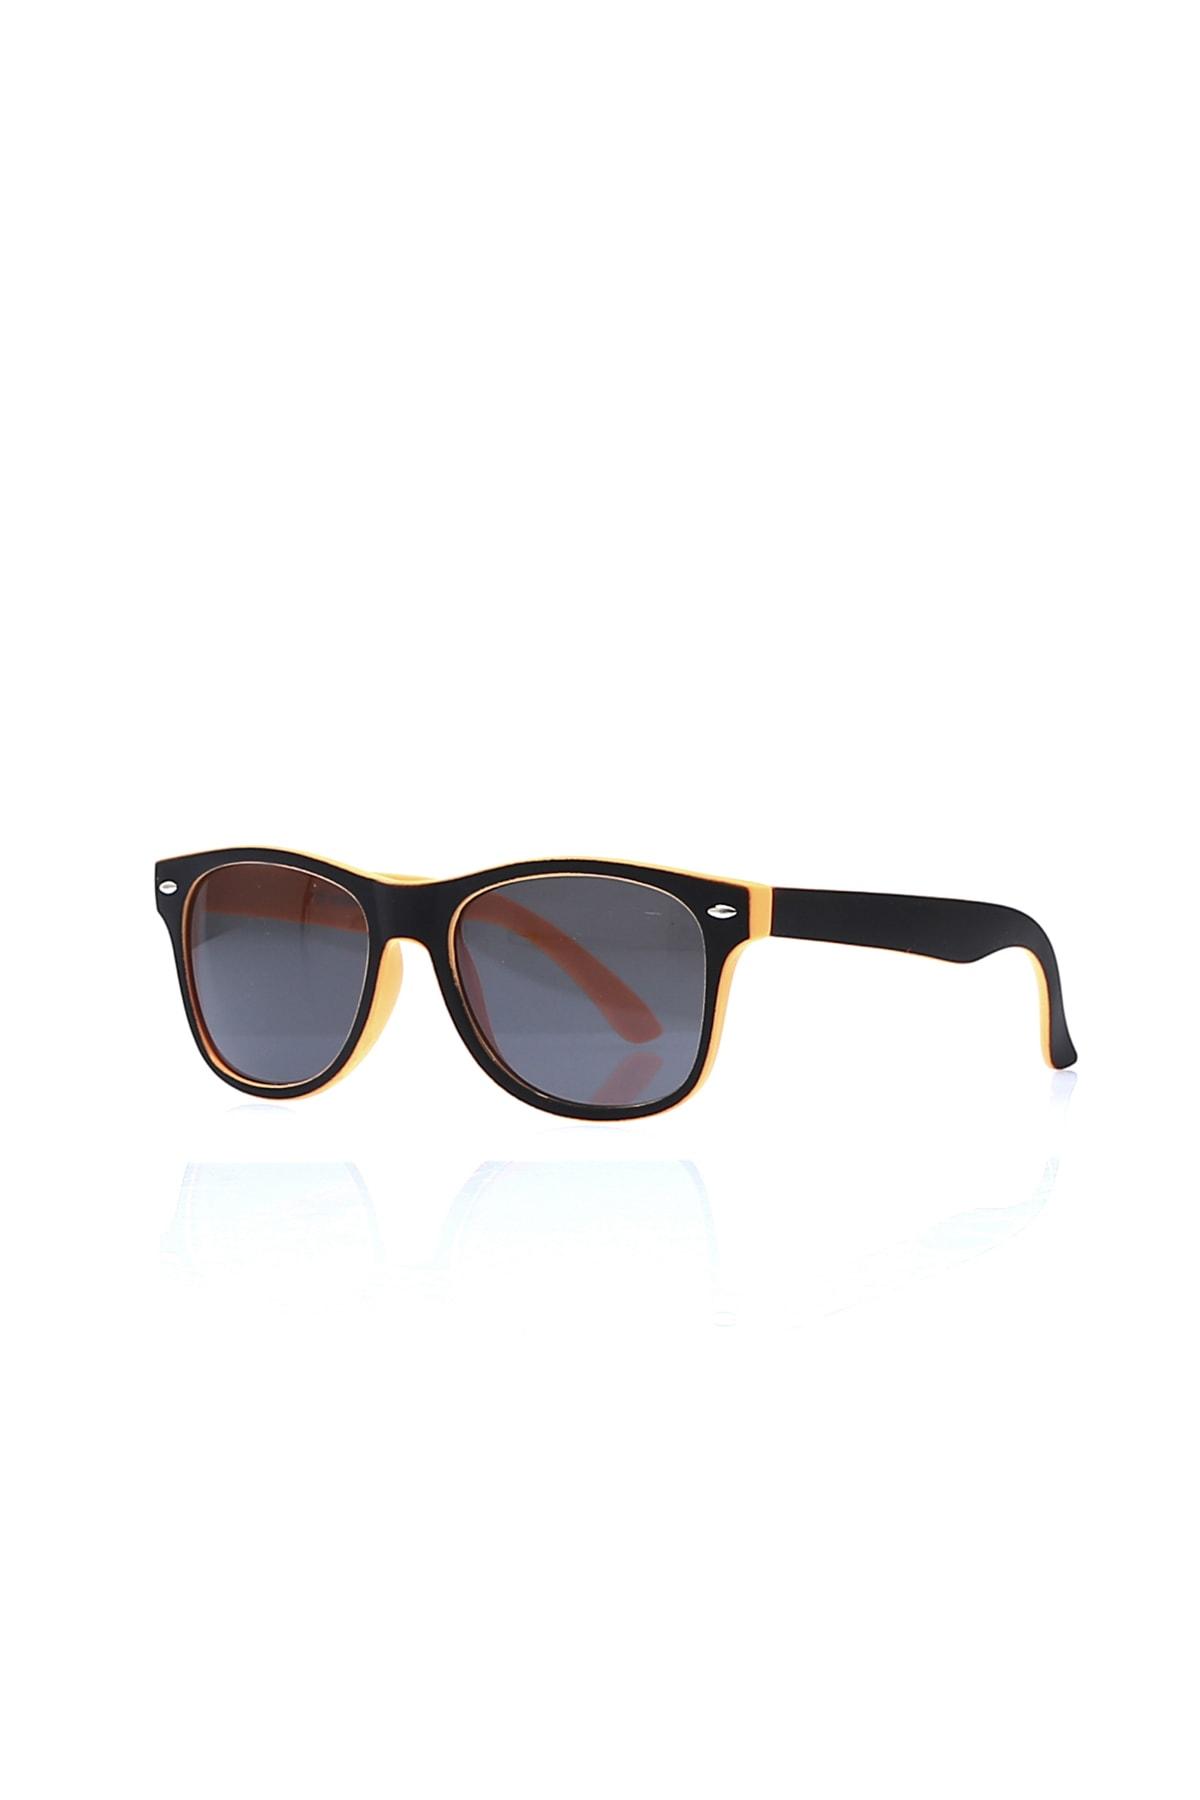 عینک آفتابی مدل 2021 برند By Harmony کد ty6866532